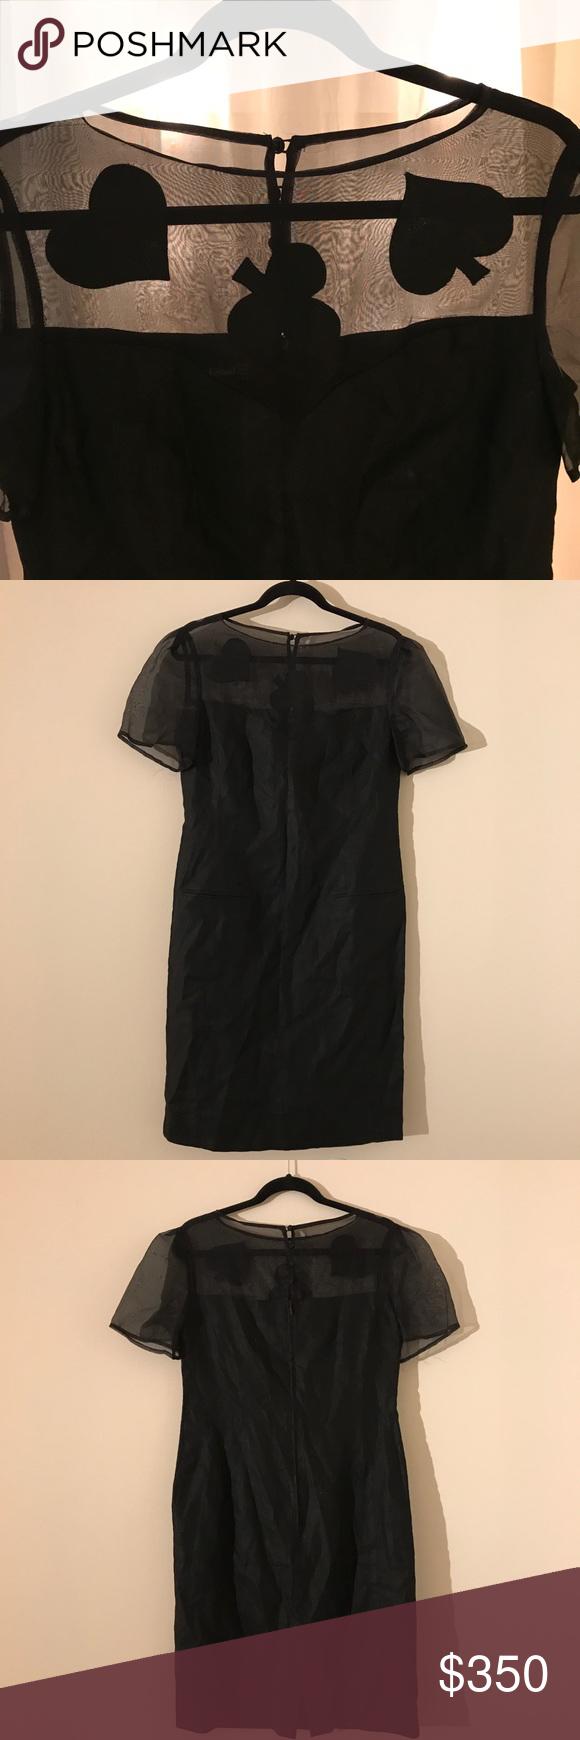 Louis Feraud Black Dress With Sheer Sheer Top Sheer Top Classy Dress Black Dress [ 1740 x 580 Pixel ]